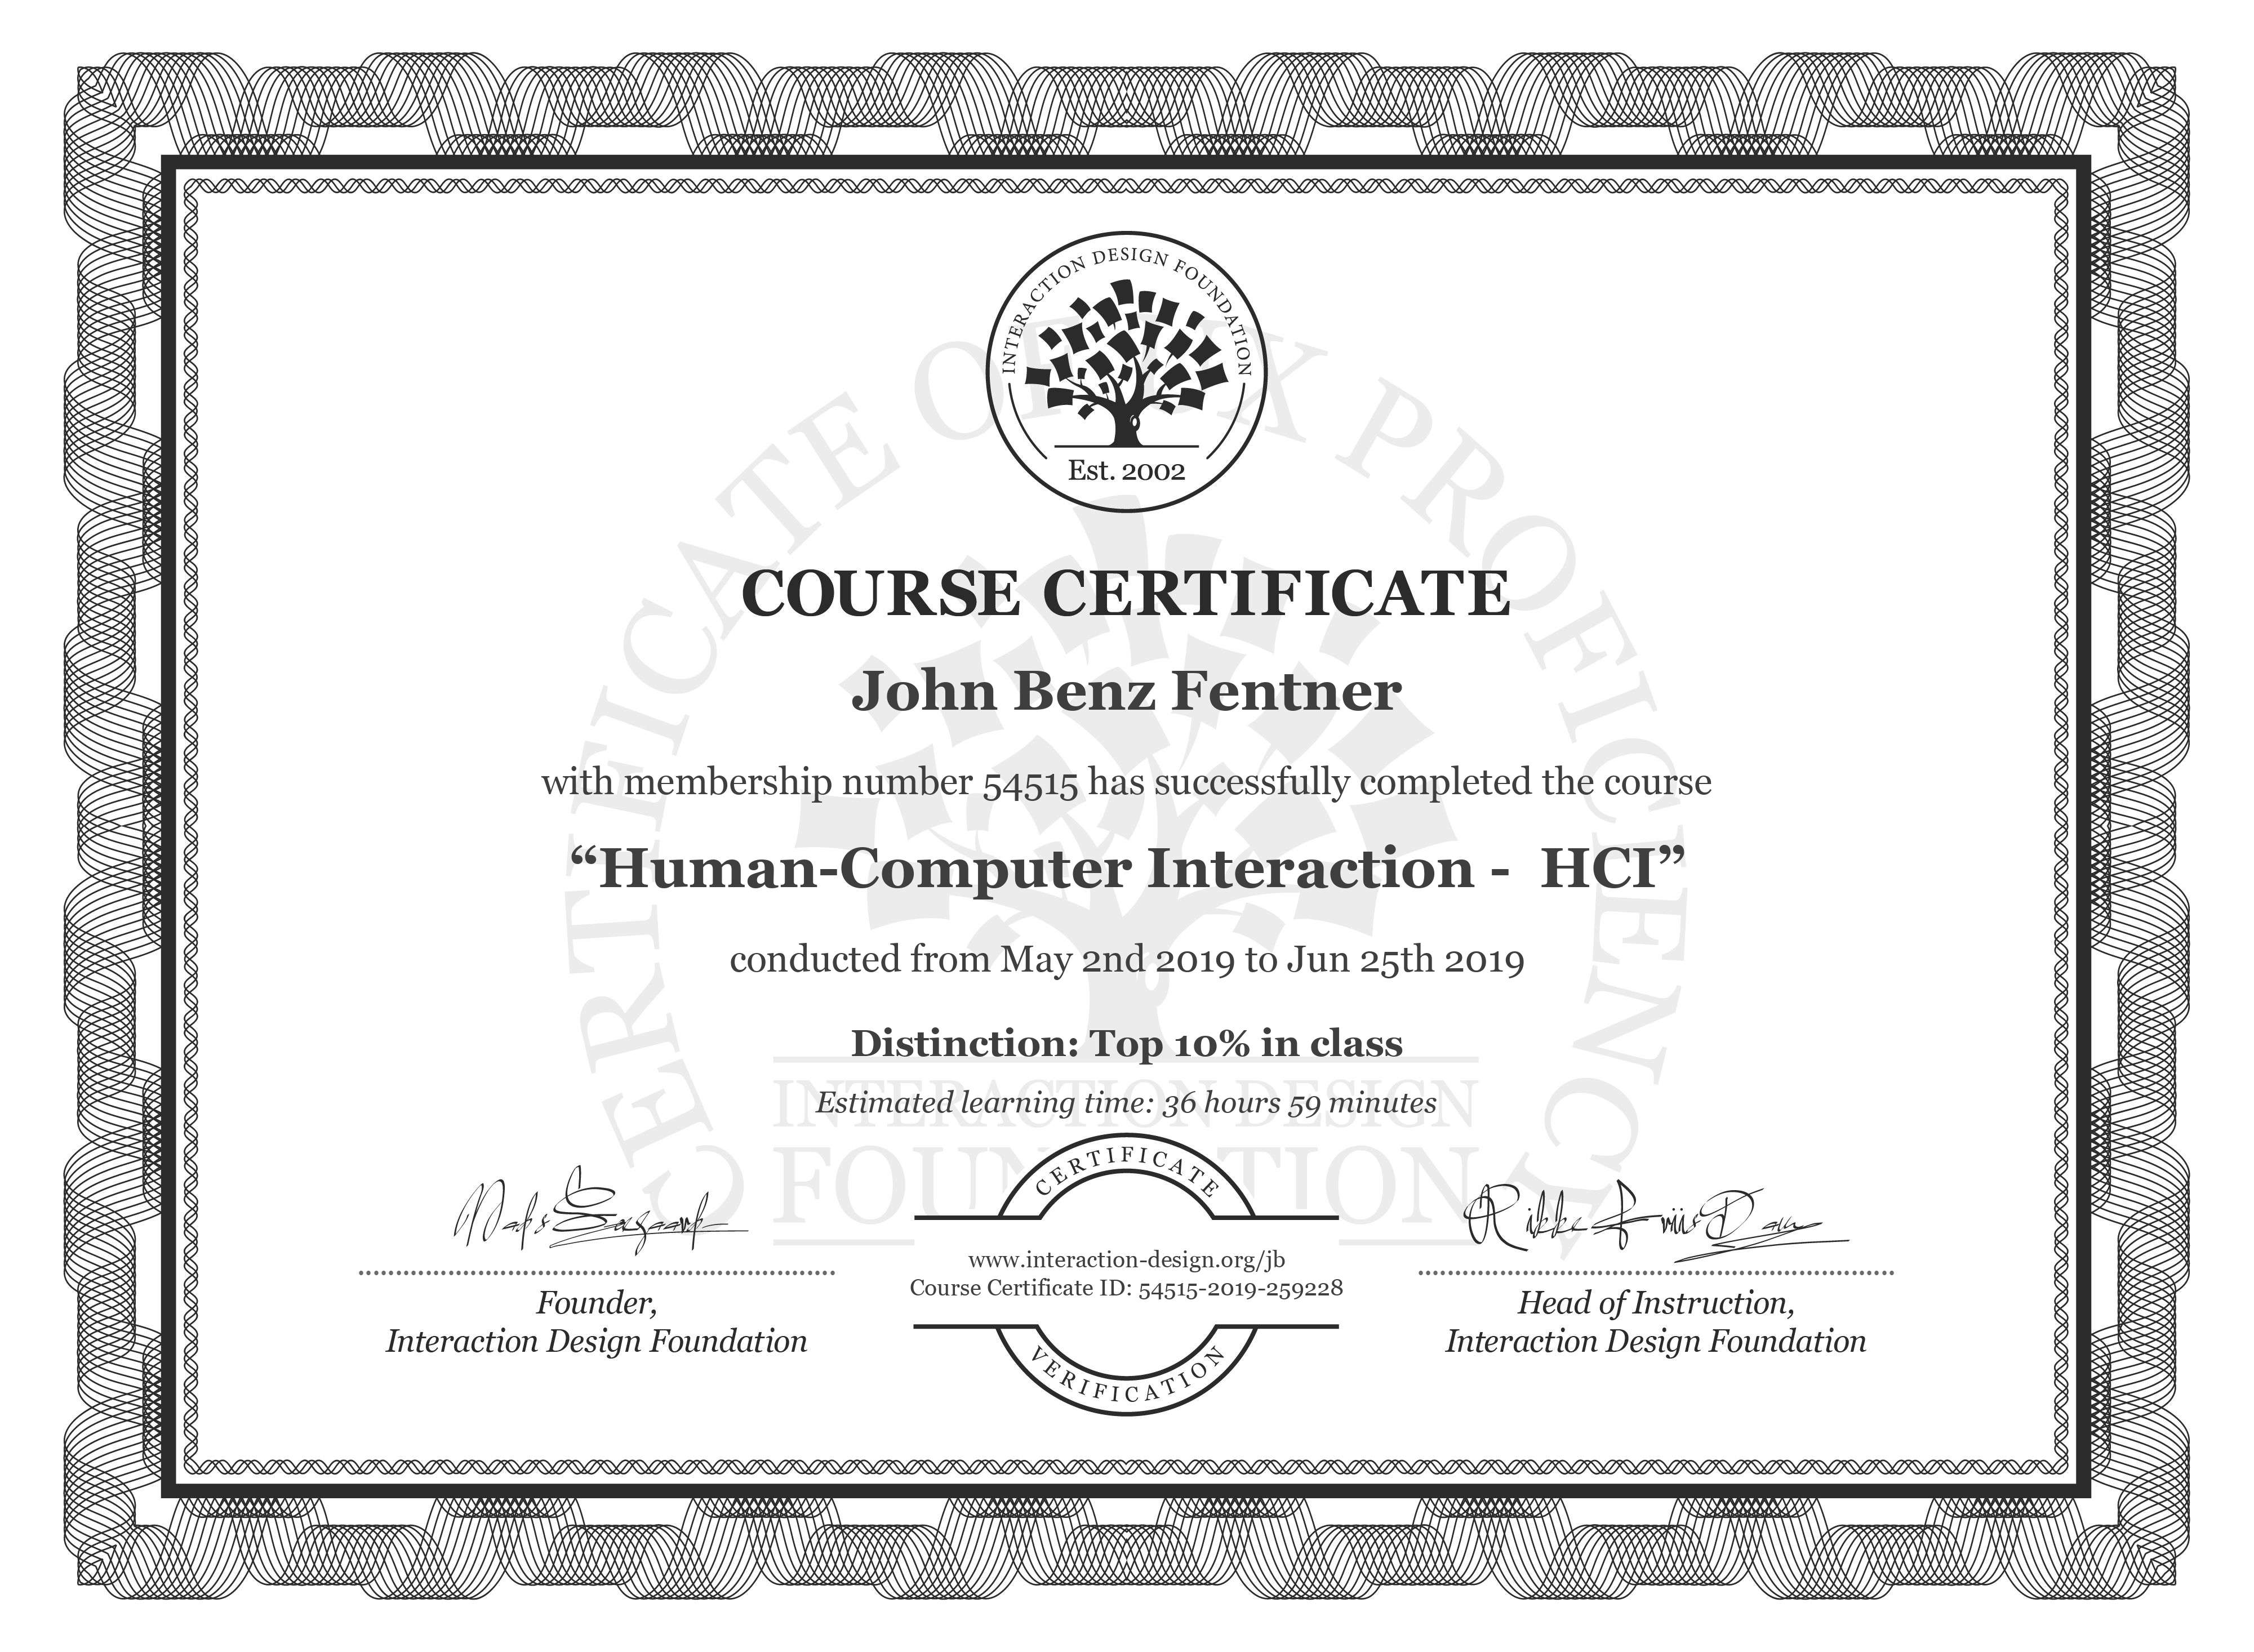 John Benz Fentner's Course Certificate: Human-Computer Interaction -  HCI